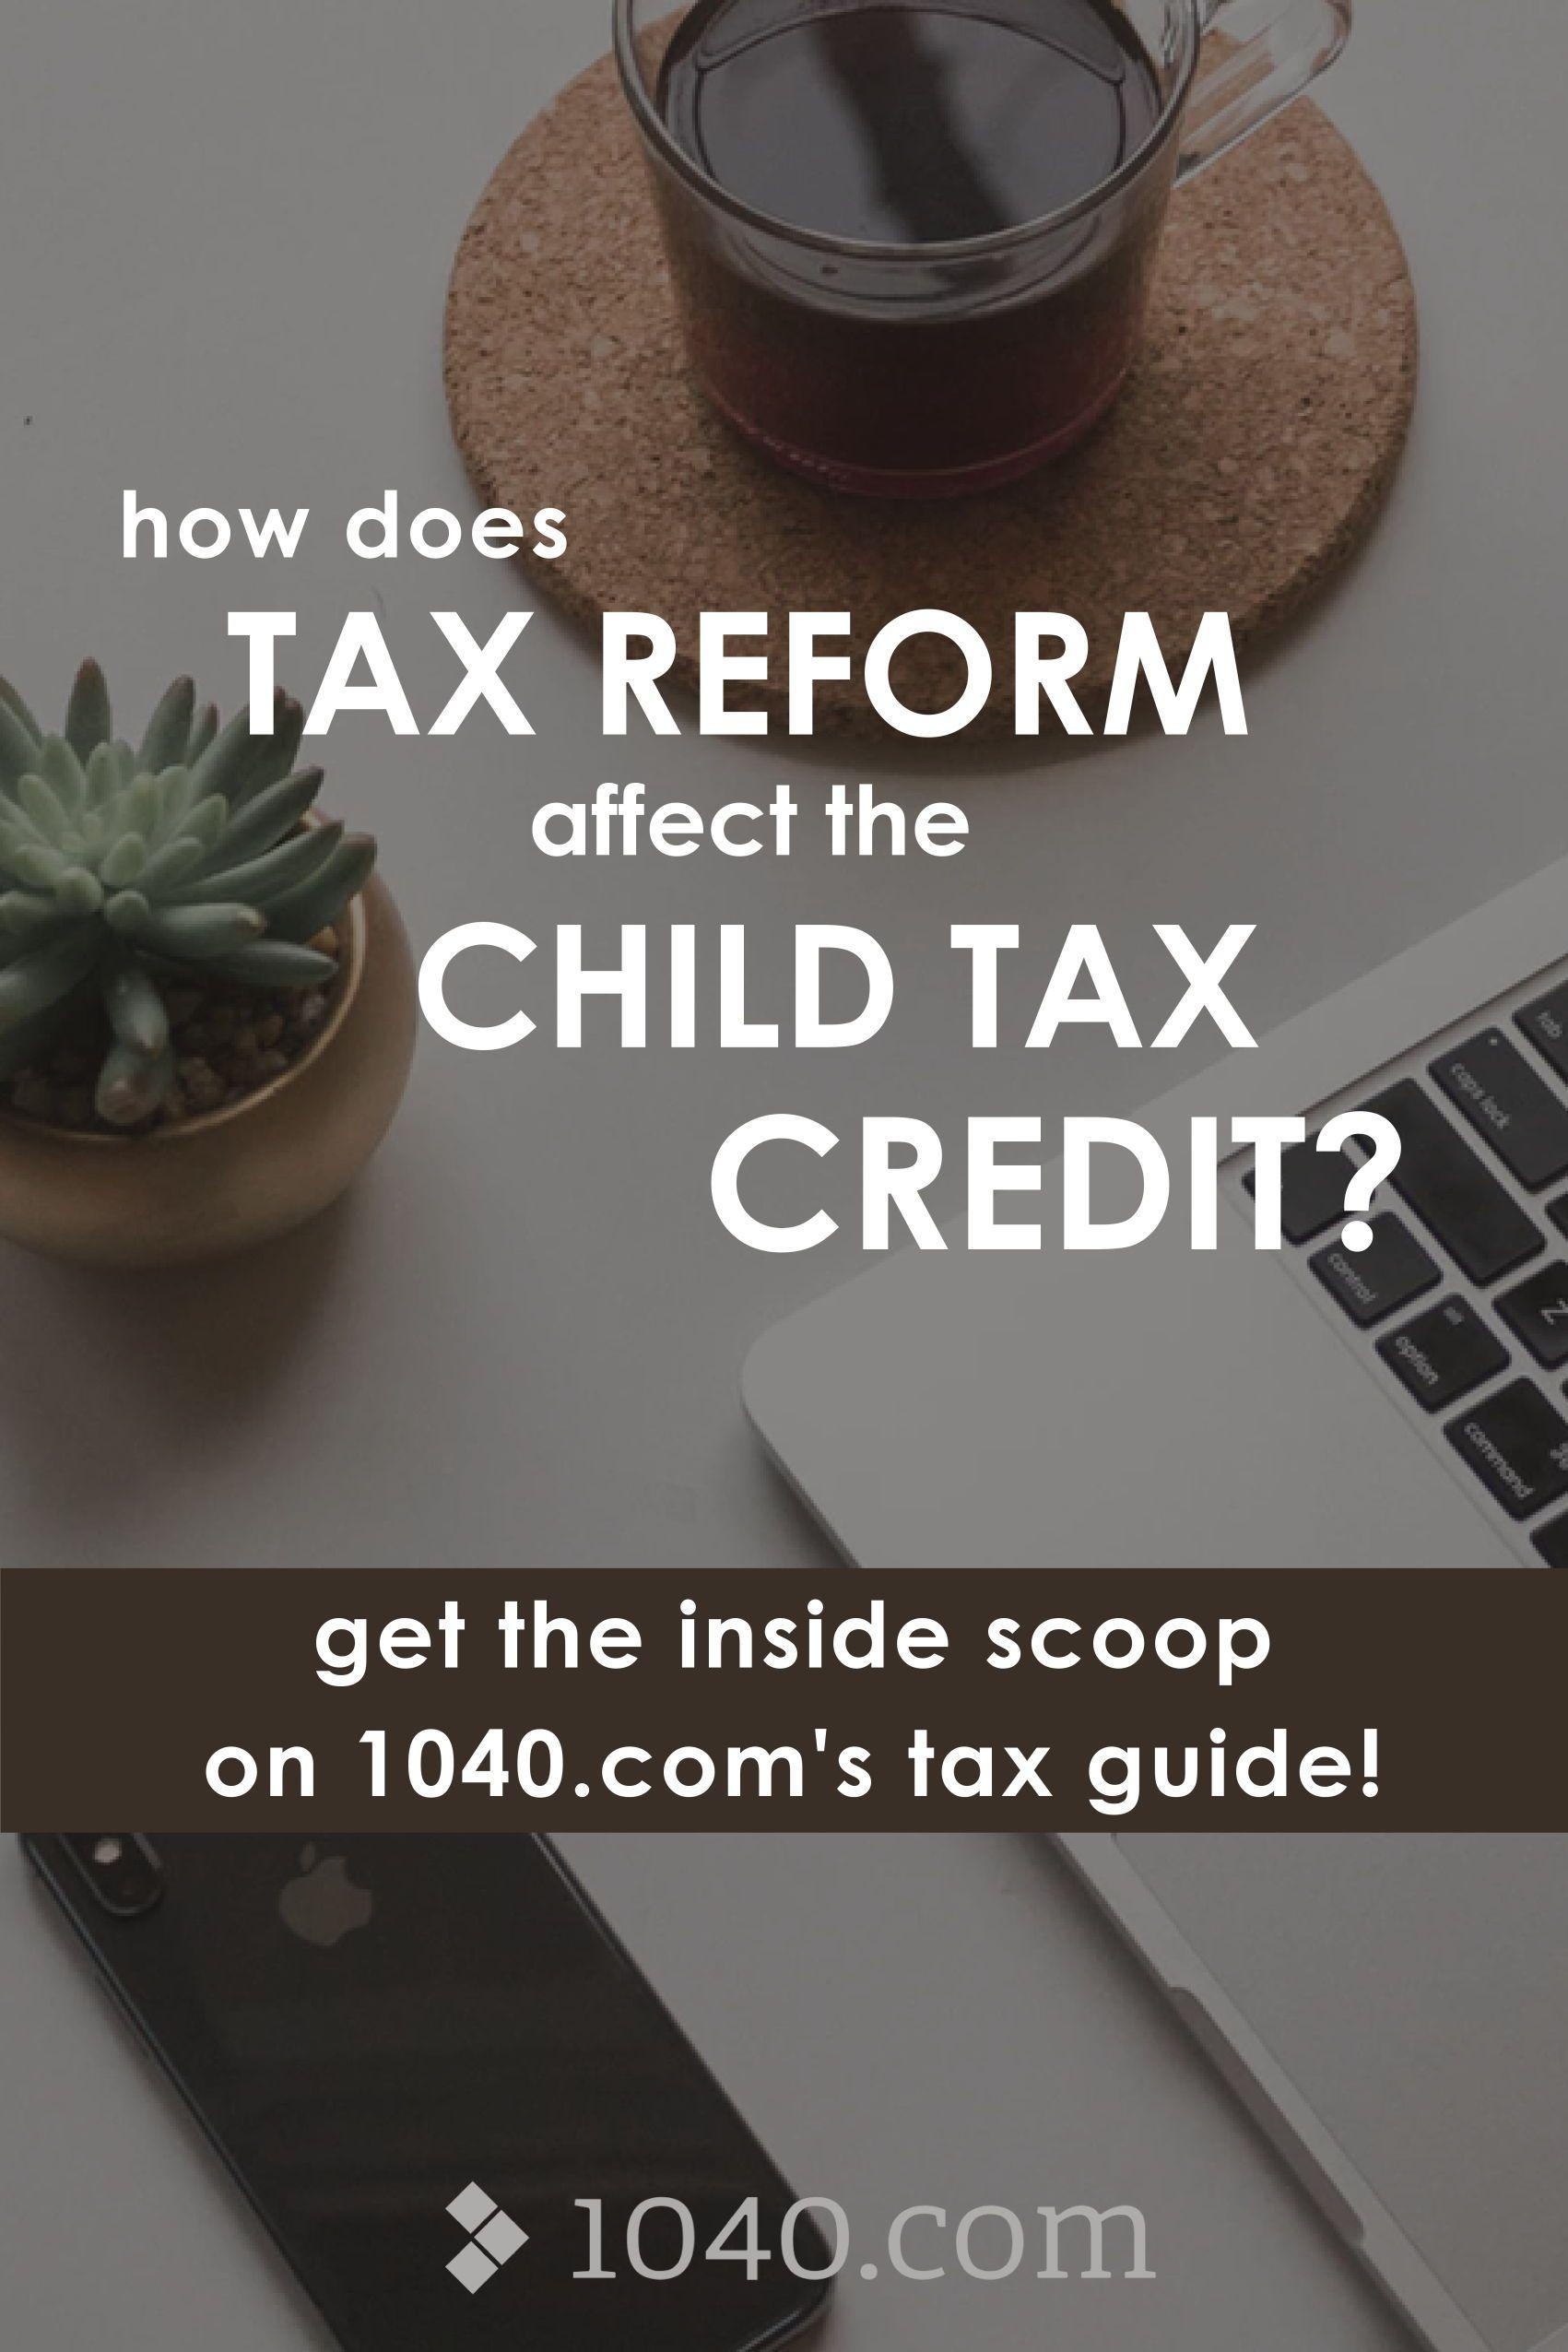 0bb466d1ab17eb364447959c07dabd1a - How Long Does It Take To Get Child Tax